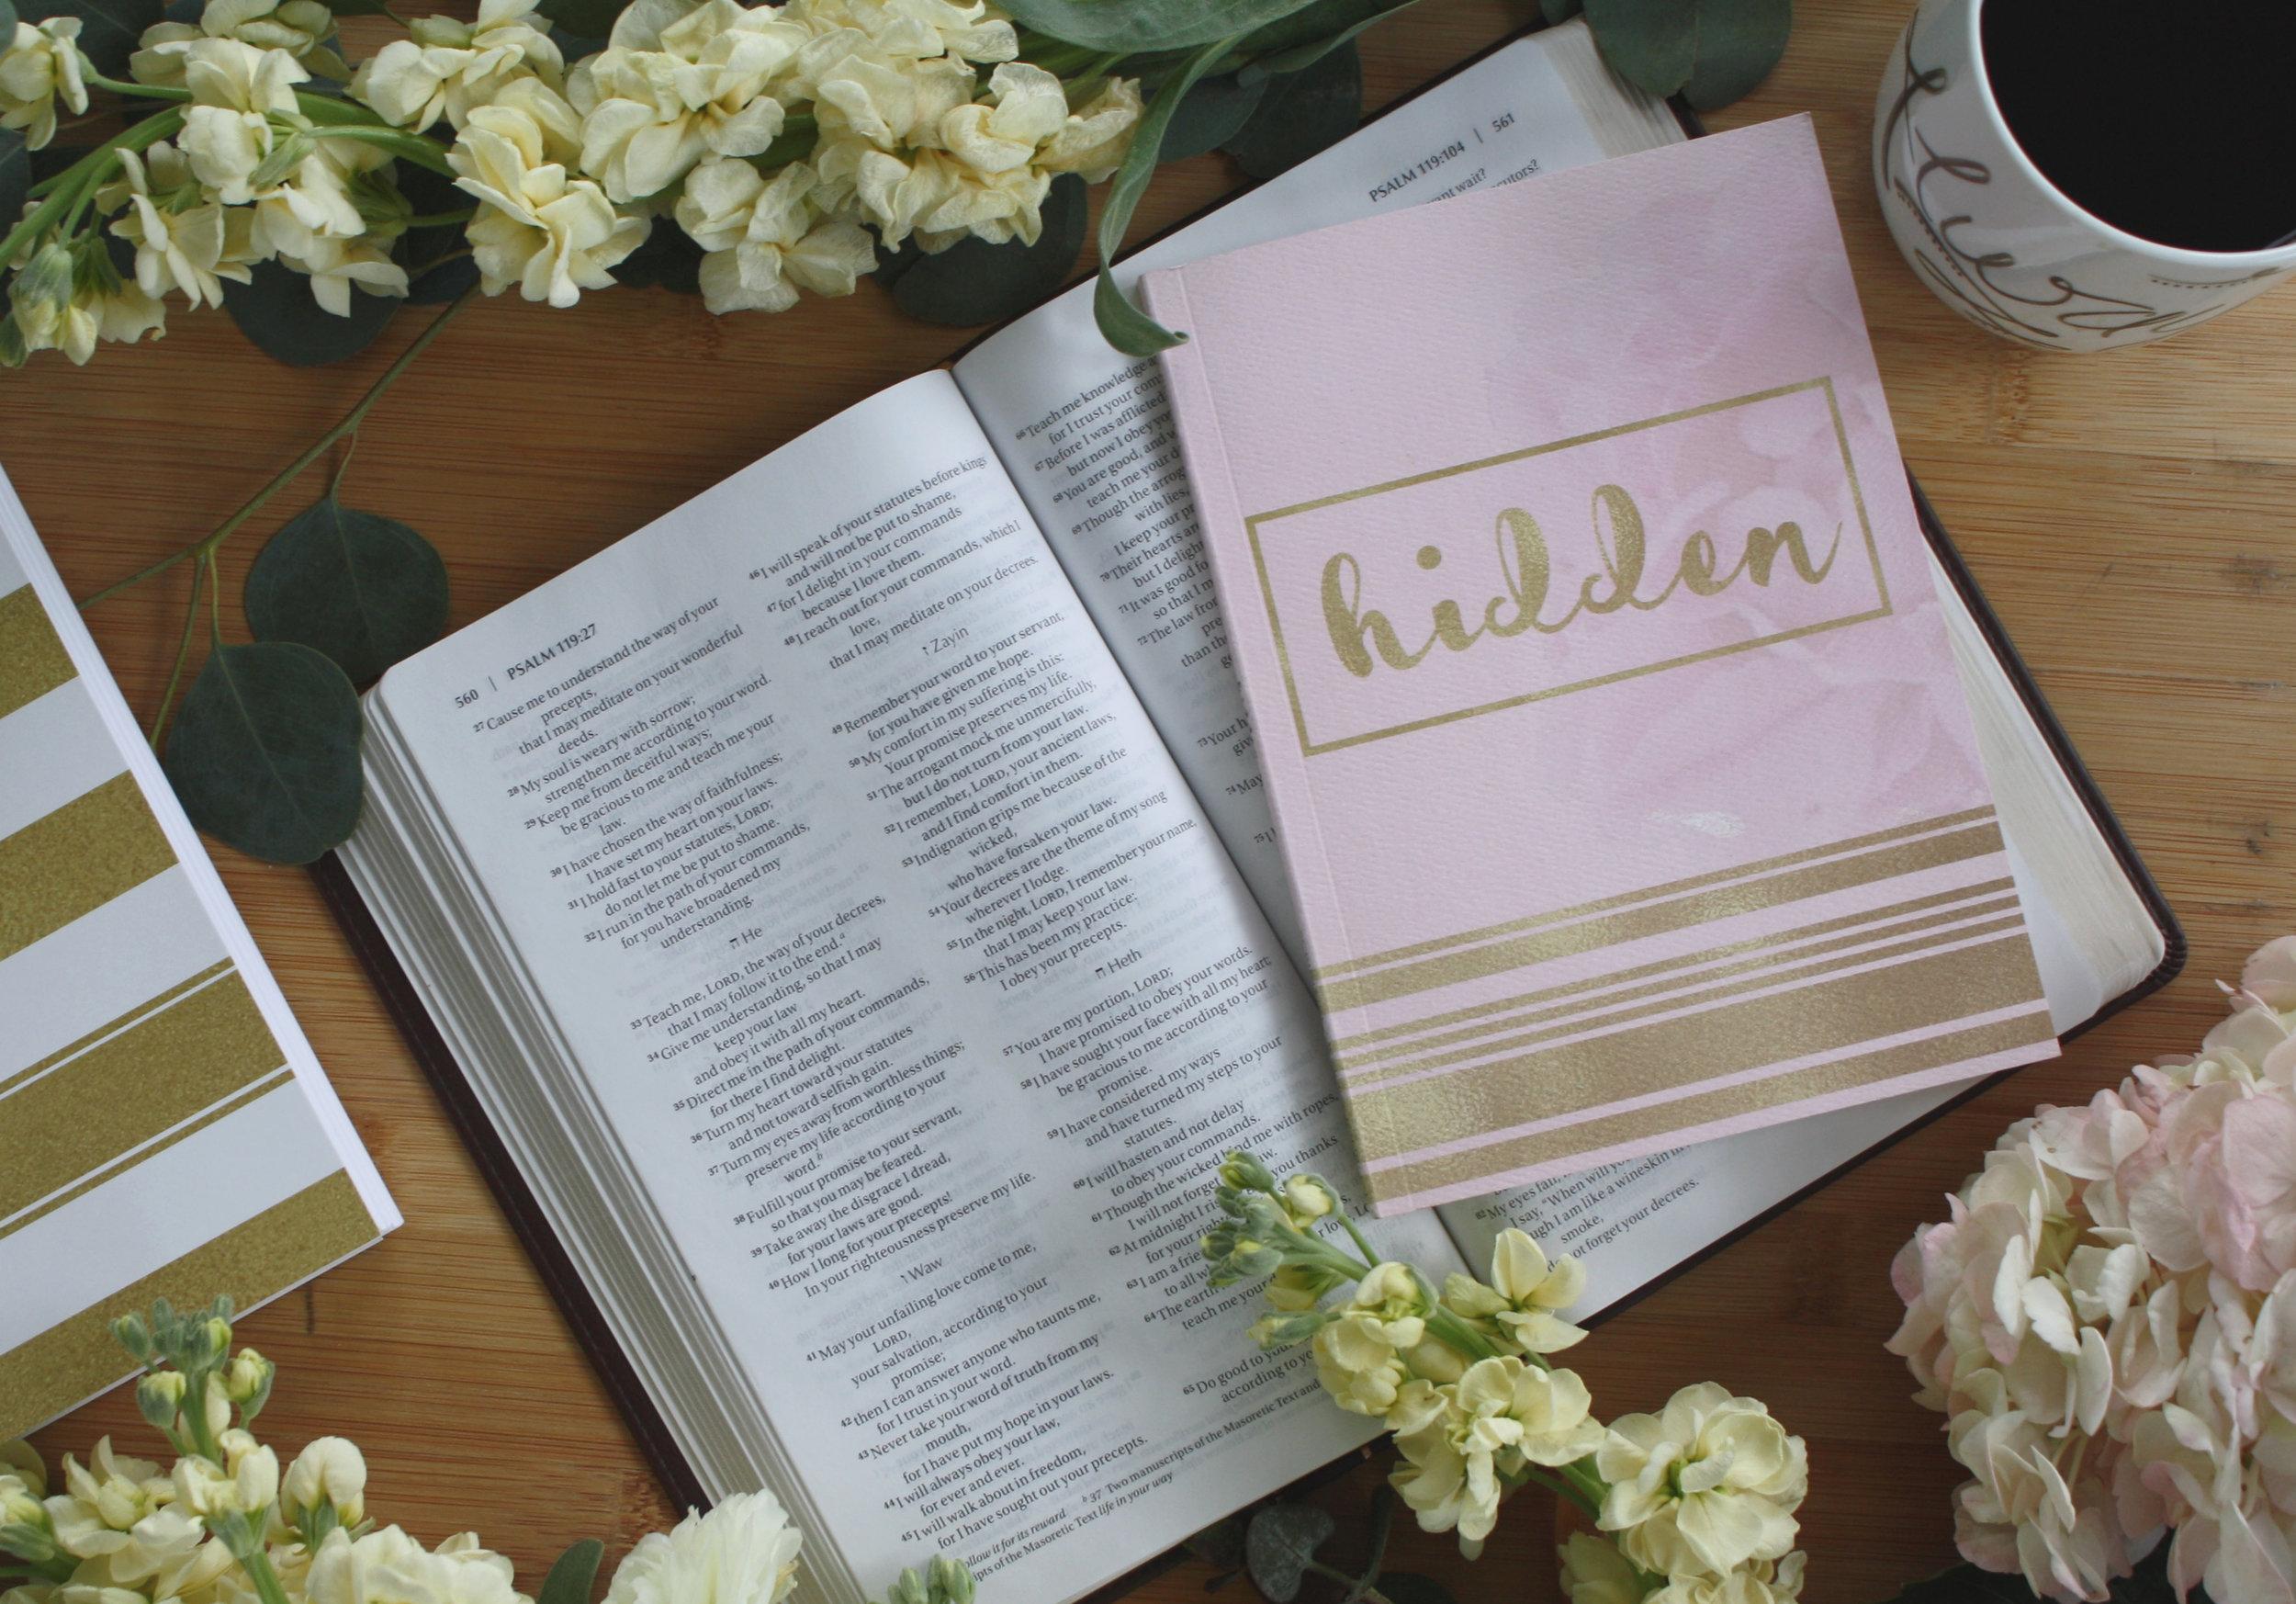 The Hidden: Scripture Memory Journal is available at ToChooseJoy.com/hidden.